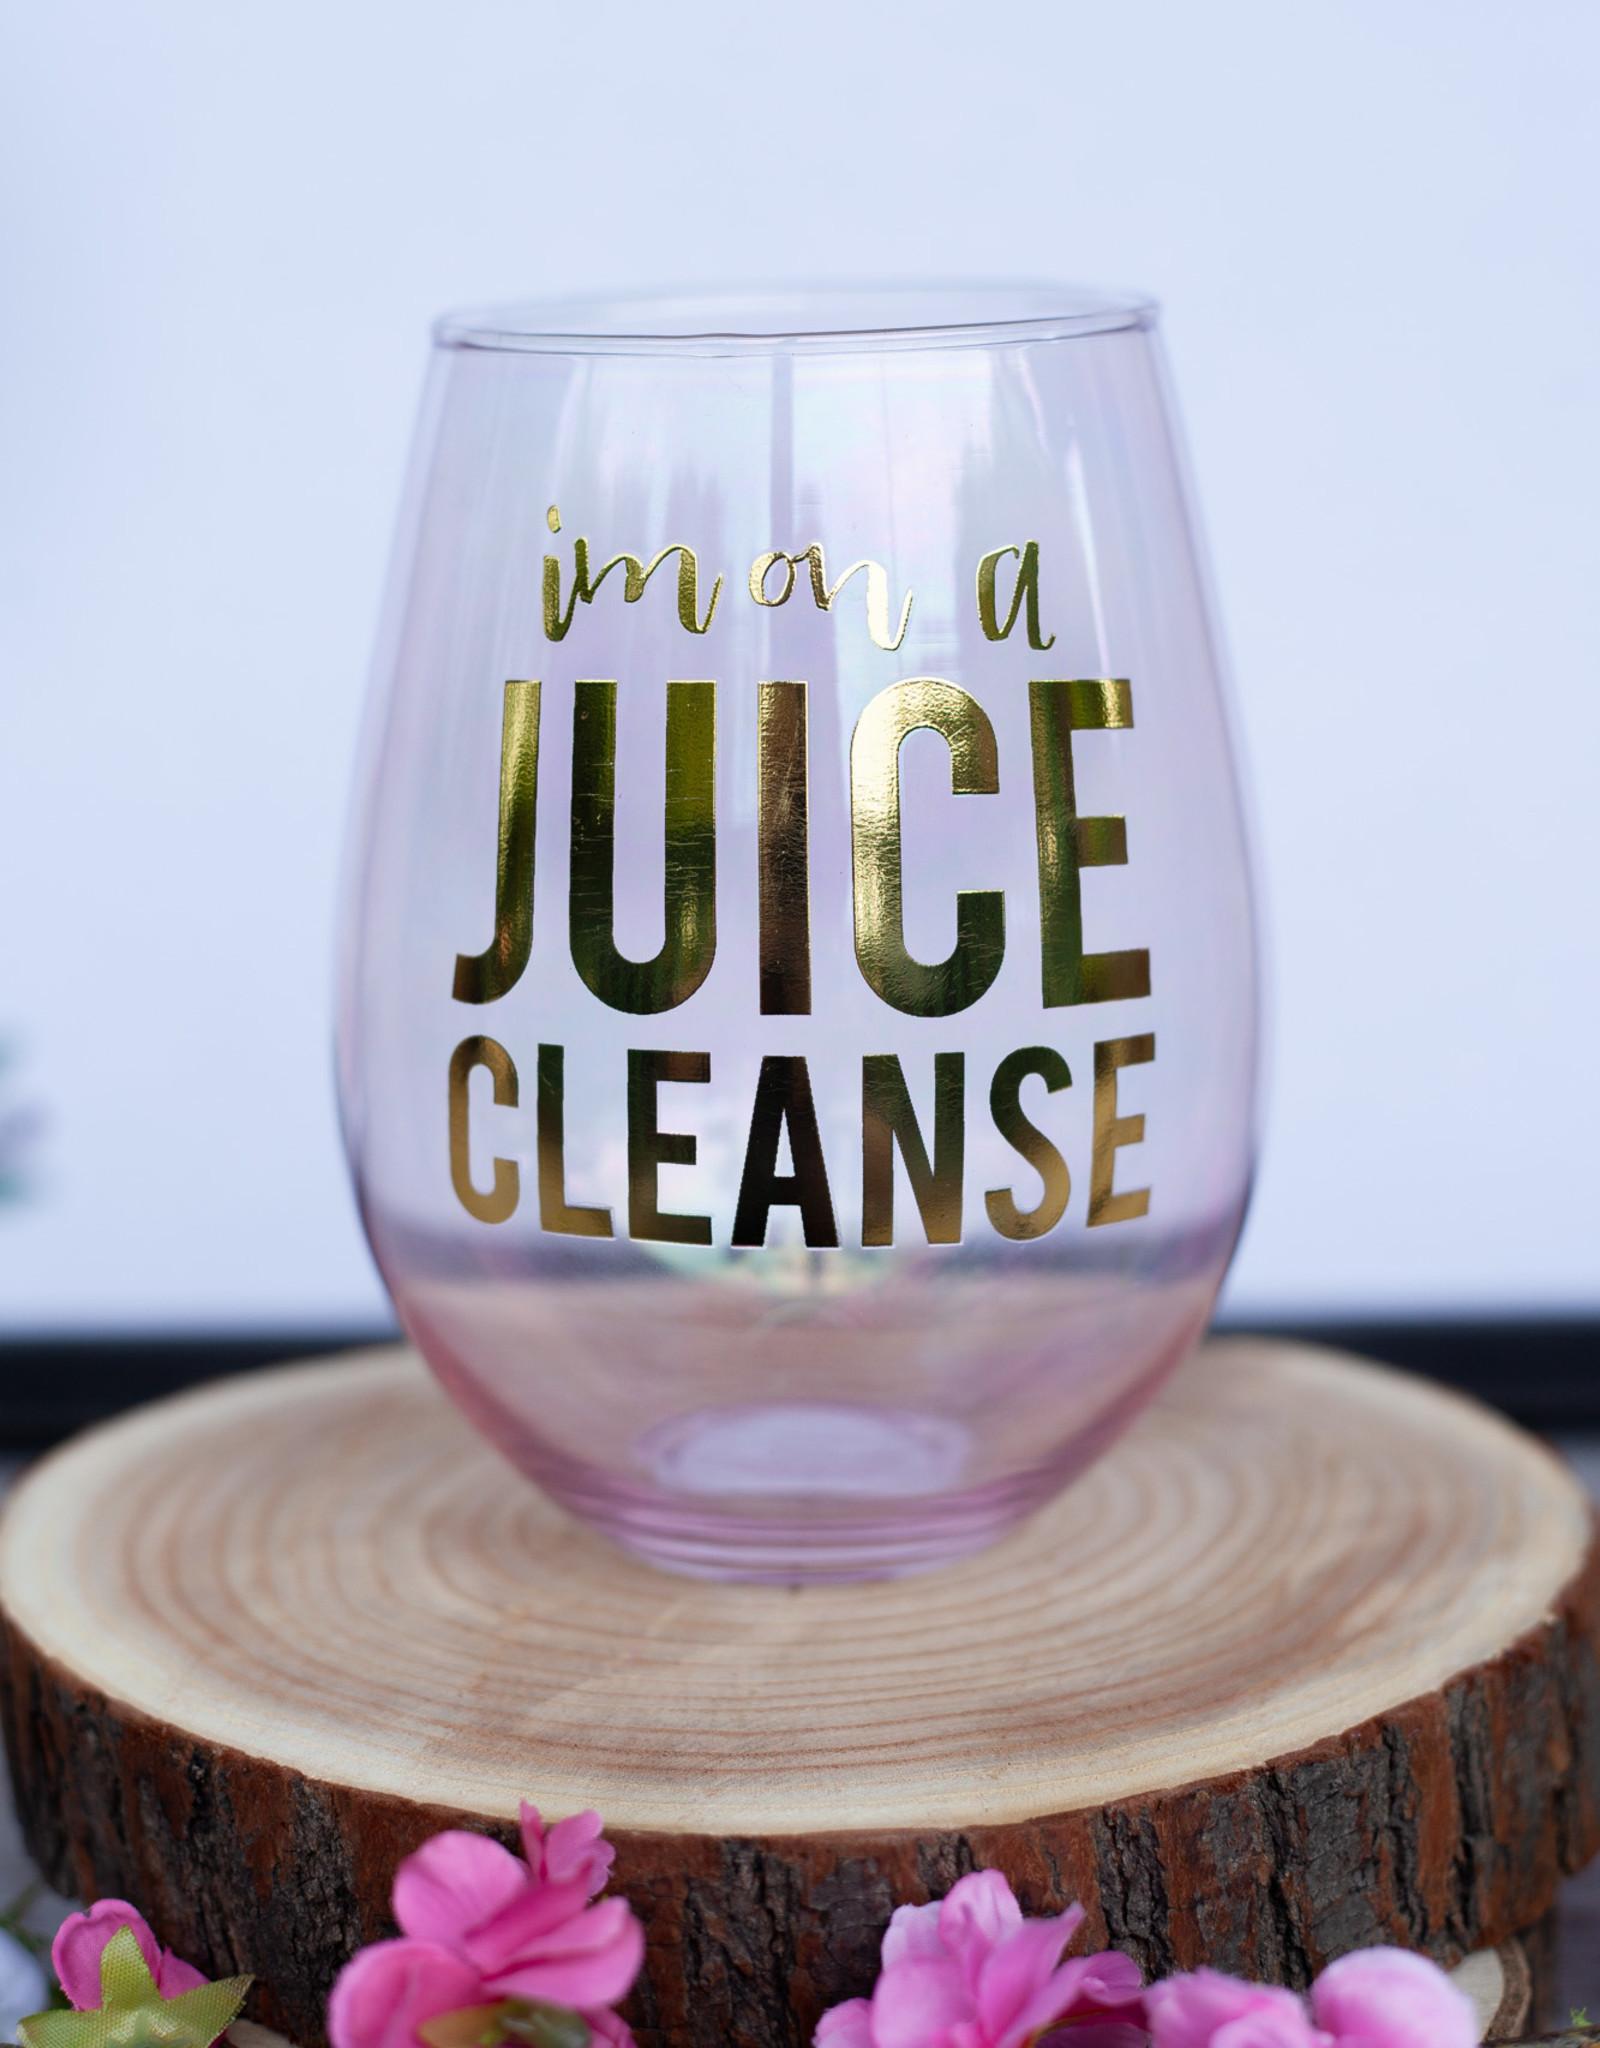 30oz Juice Cleanse Wine